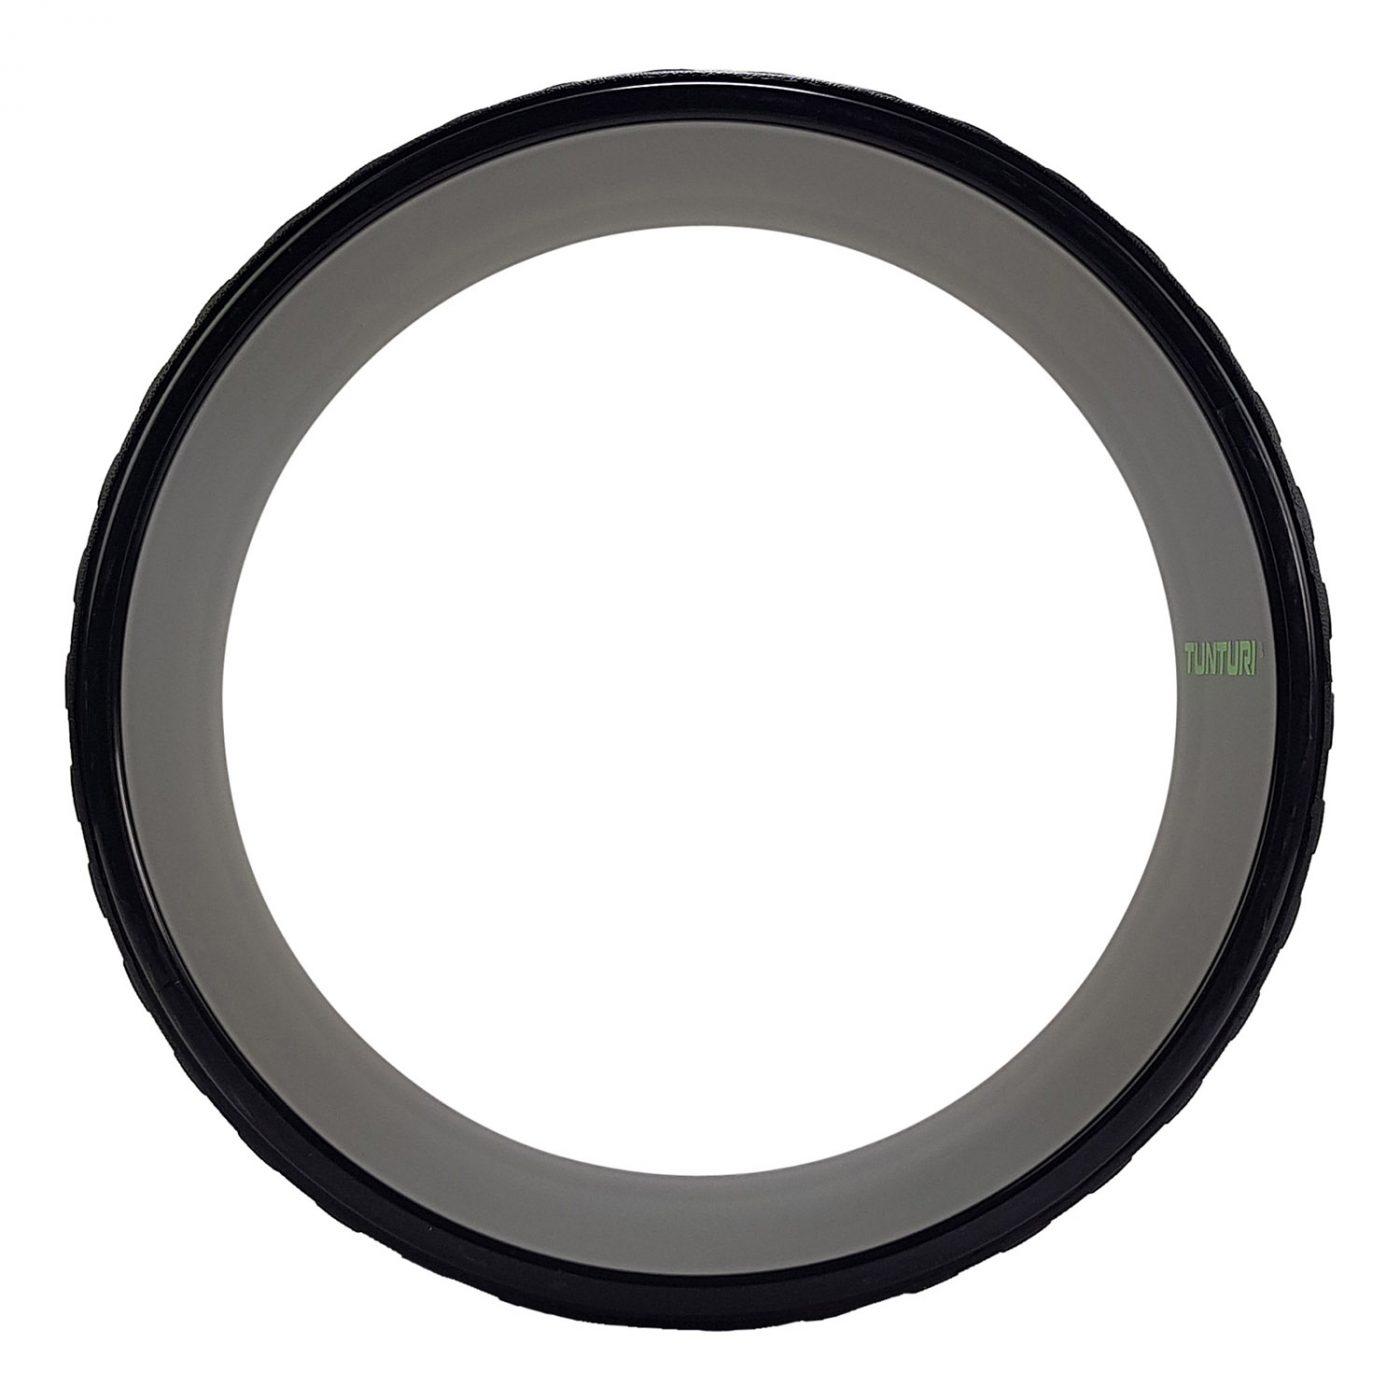 Tunturi Yoga Wheel - Yoga wiel - EVA - Zwart